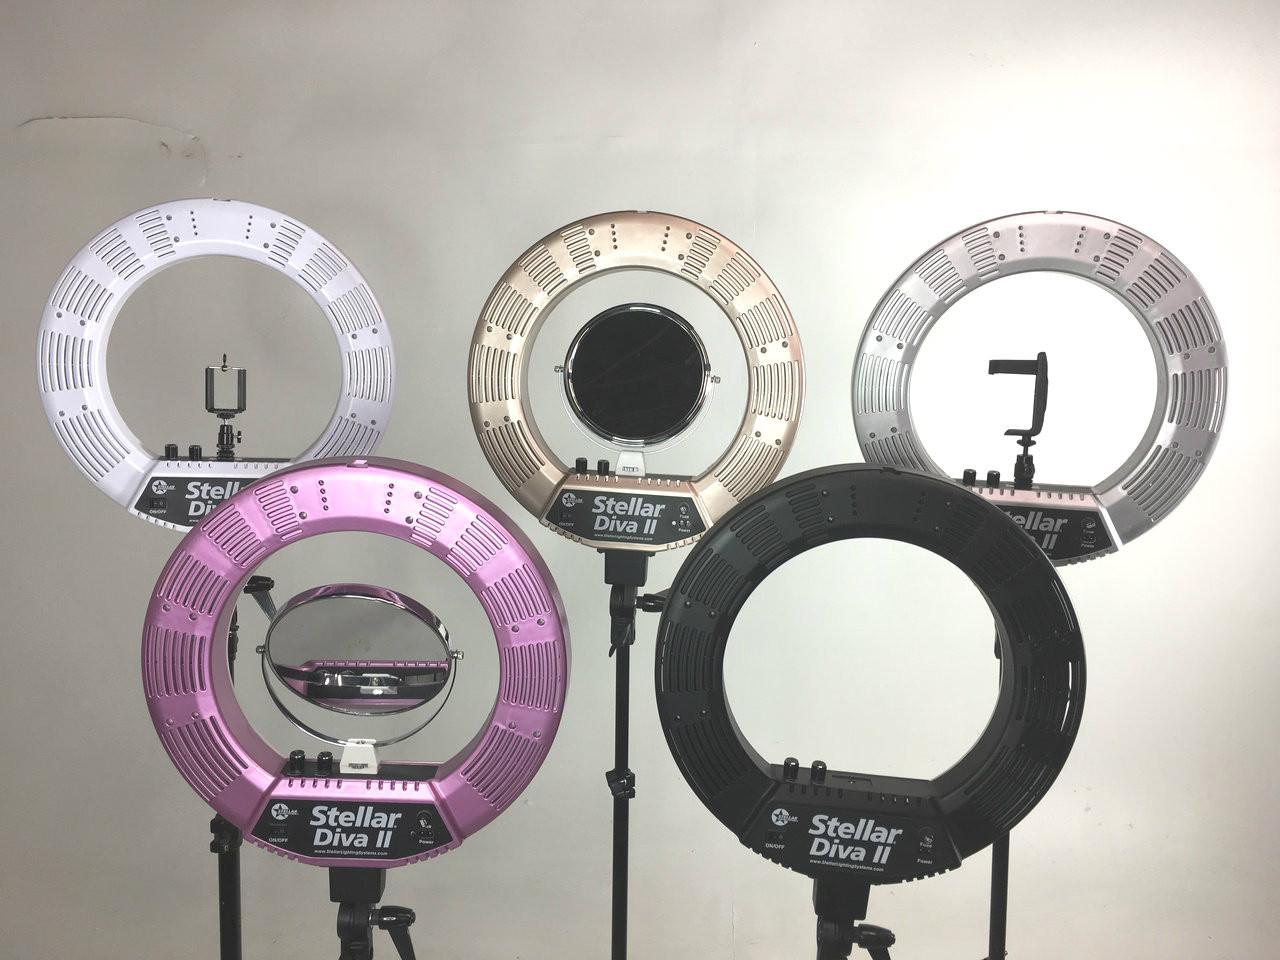 LED Diva Ring light by Stellar Lighting Systems